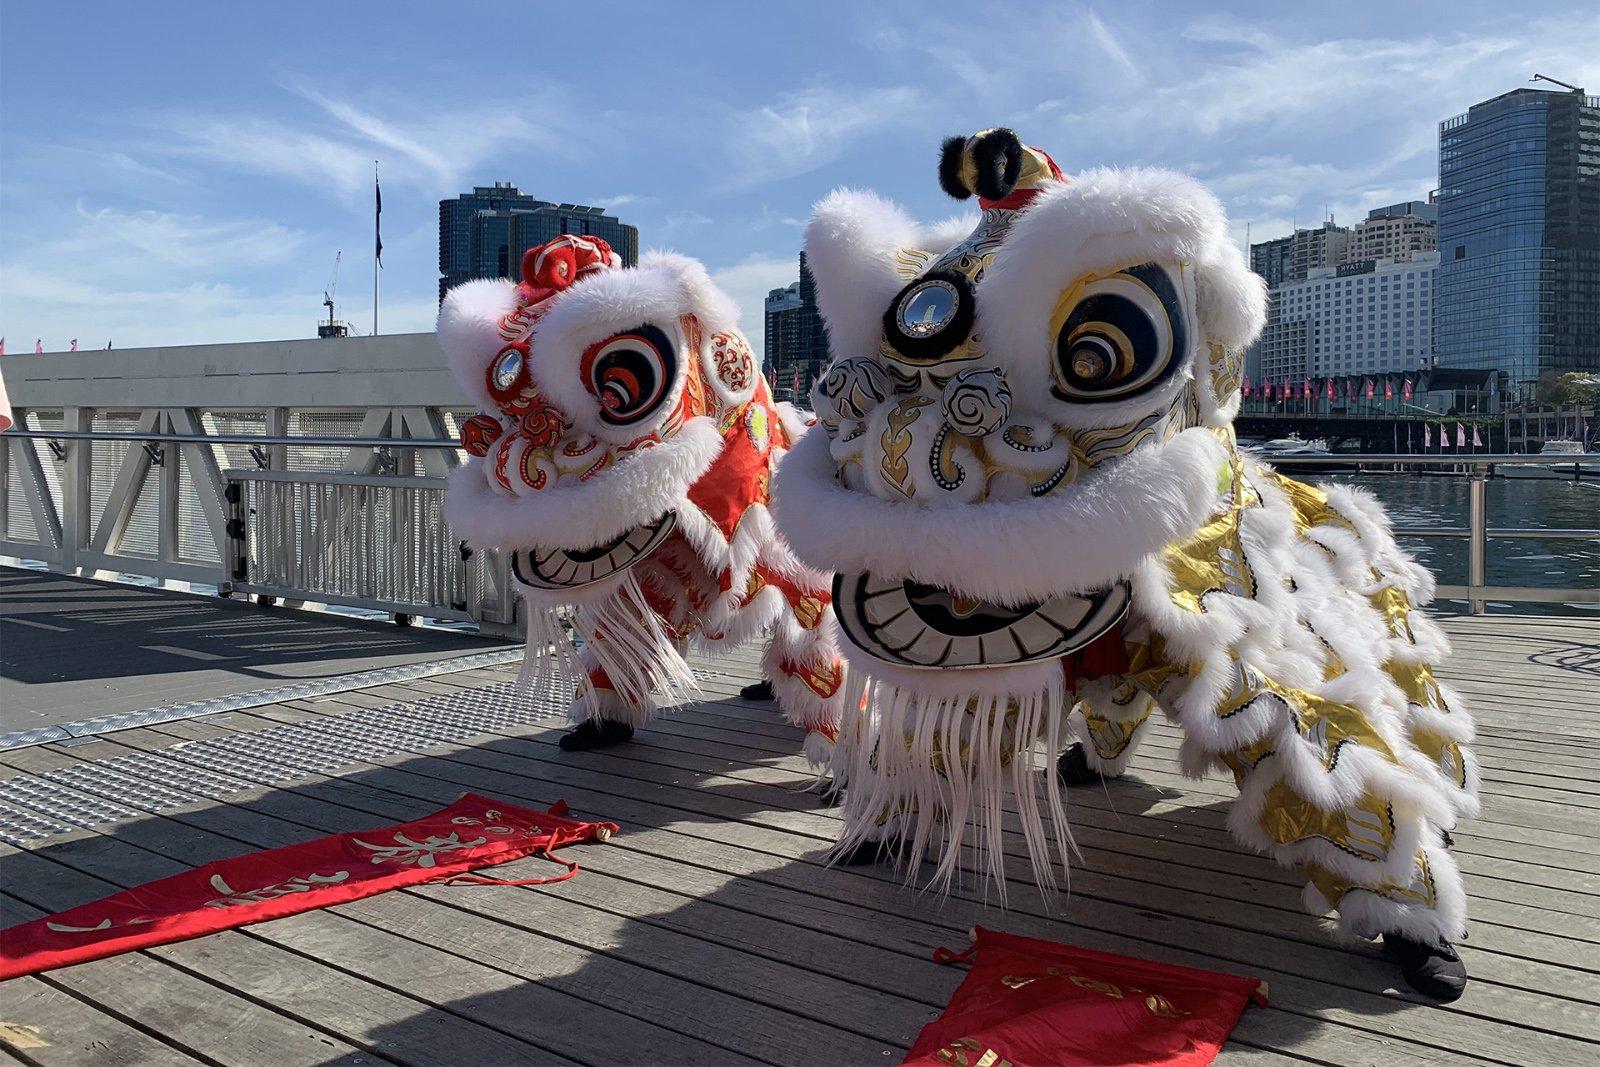 CNY 2019 Dragon Boat